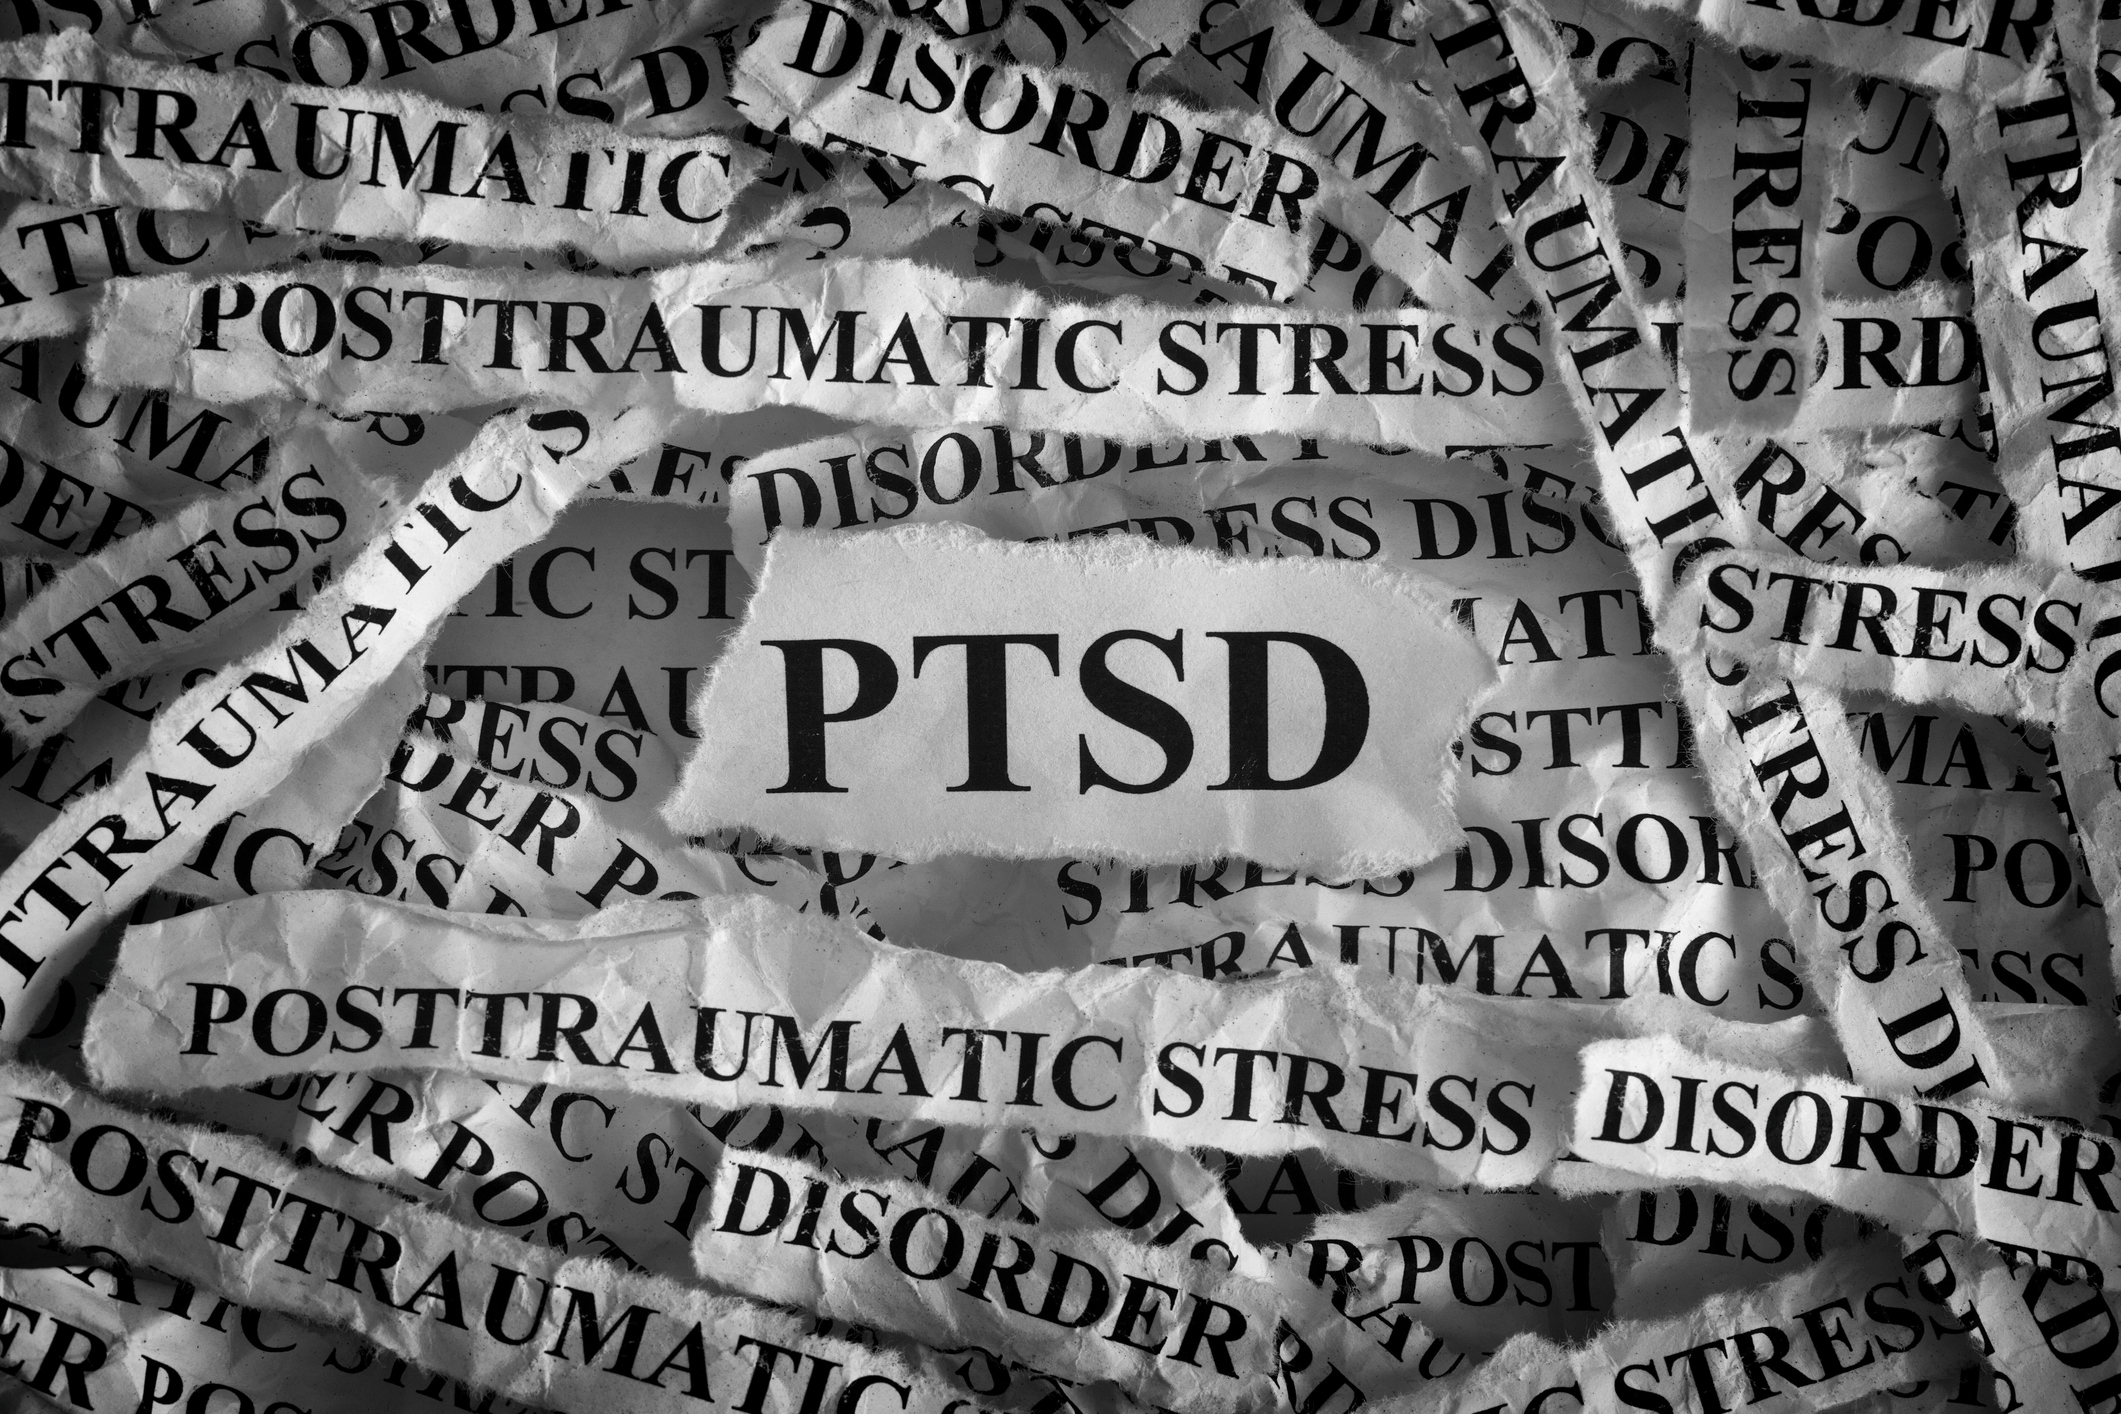 Lady Gaga Reveals Struggle With PTSD